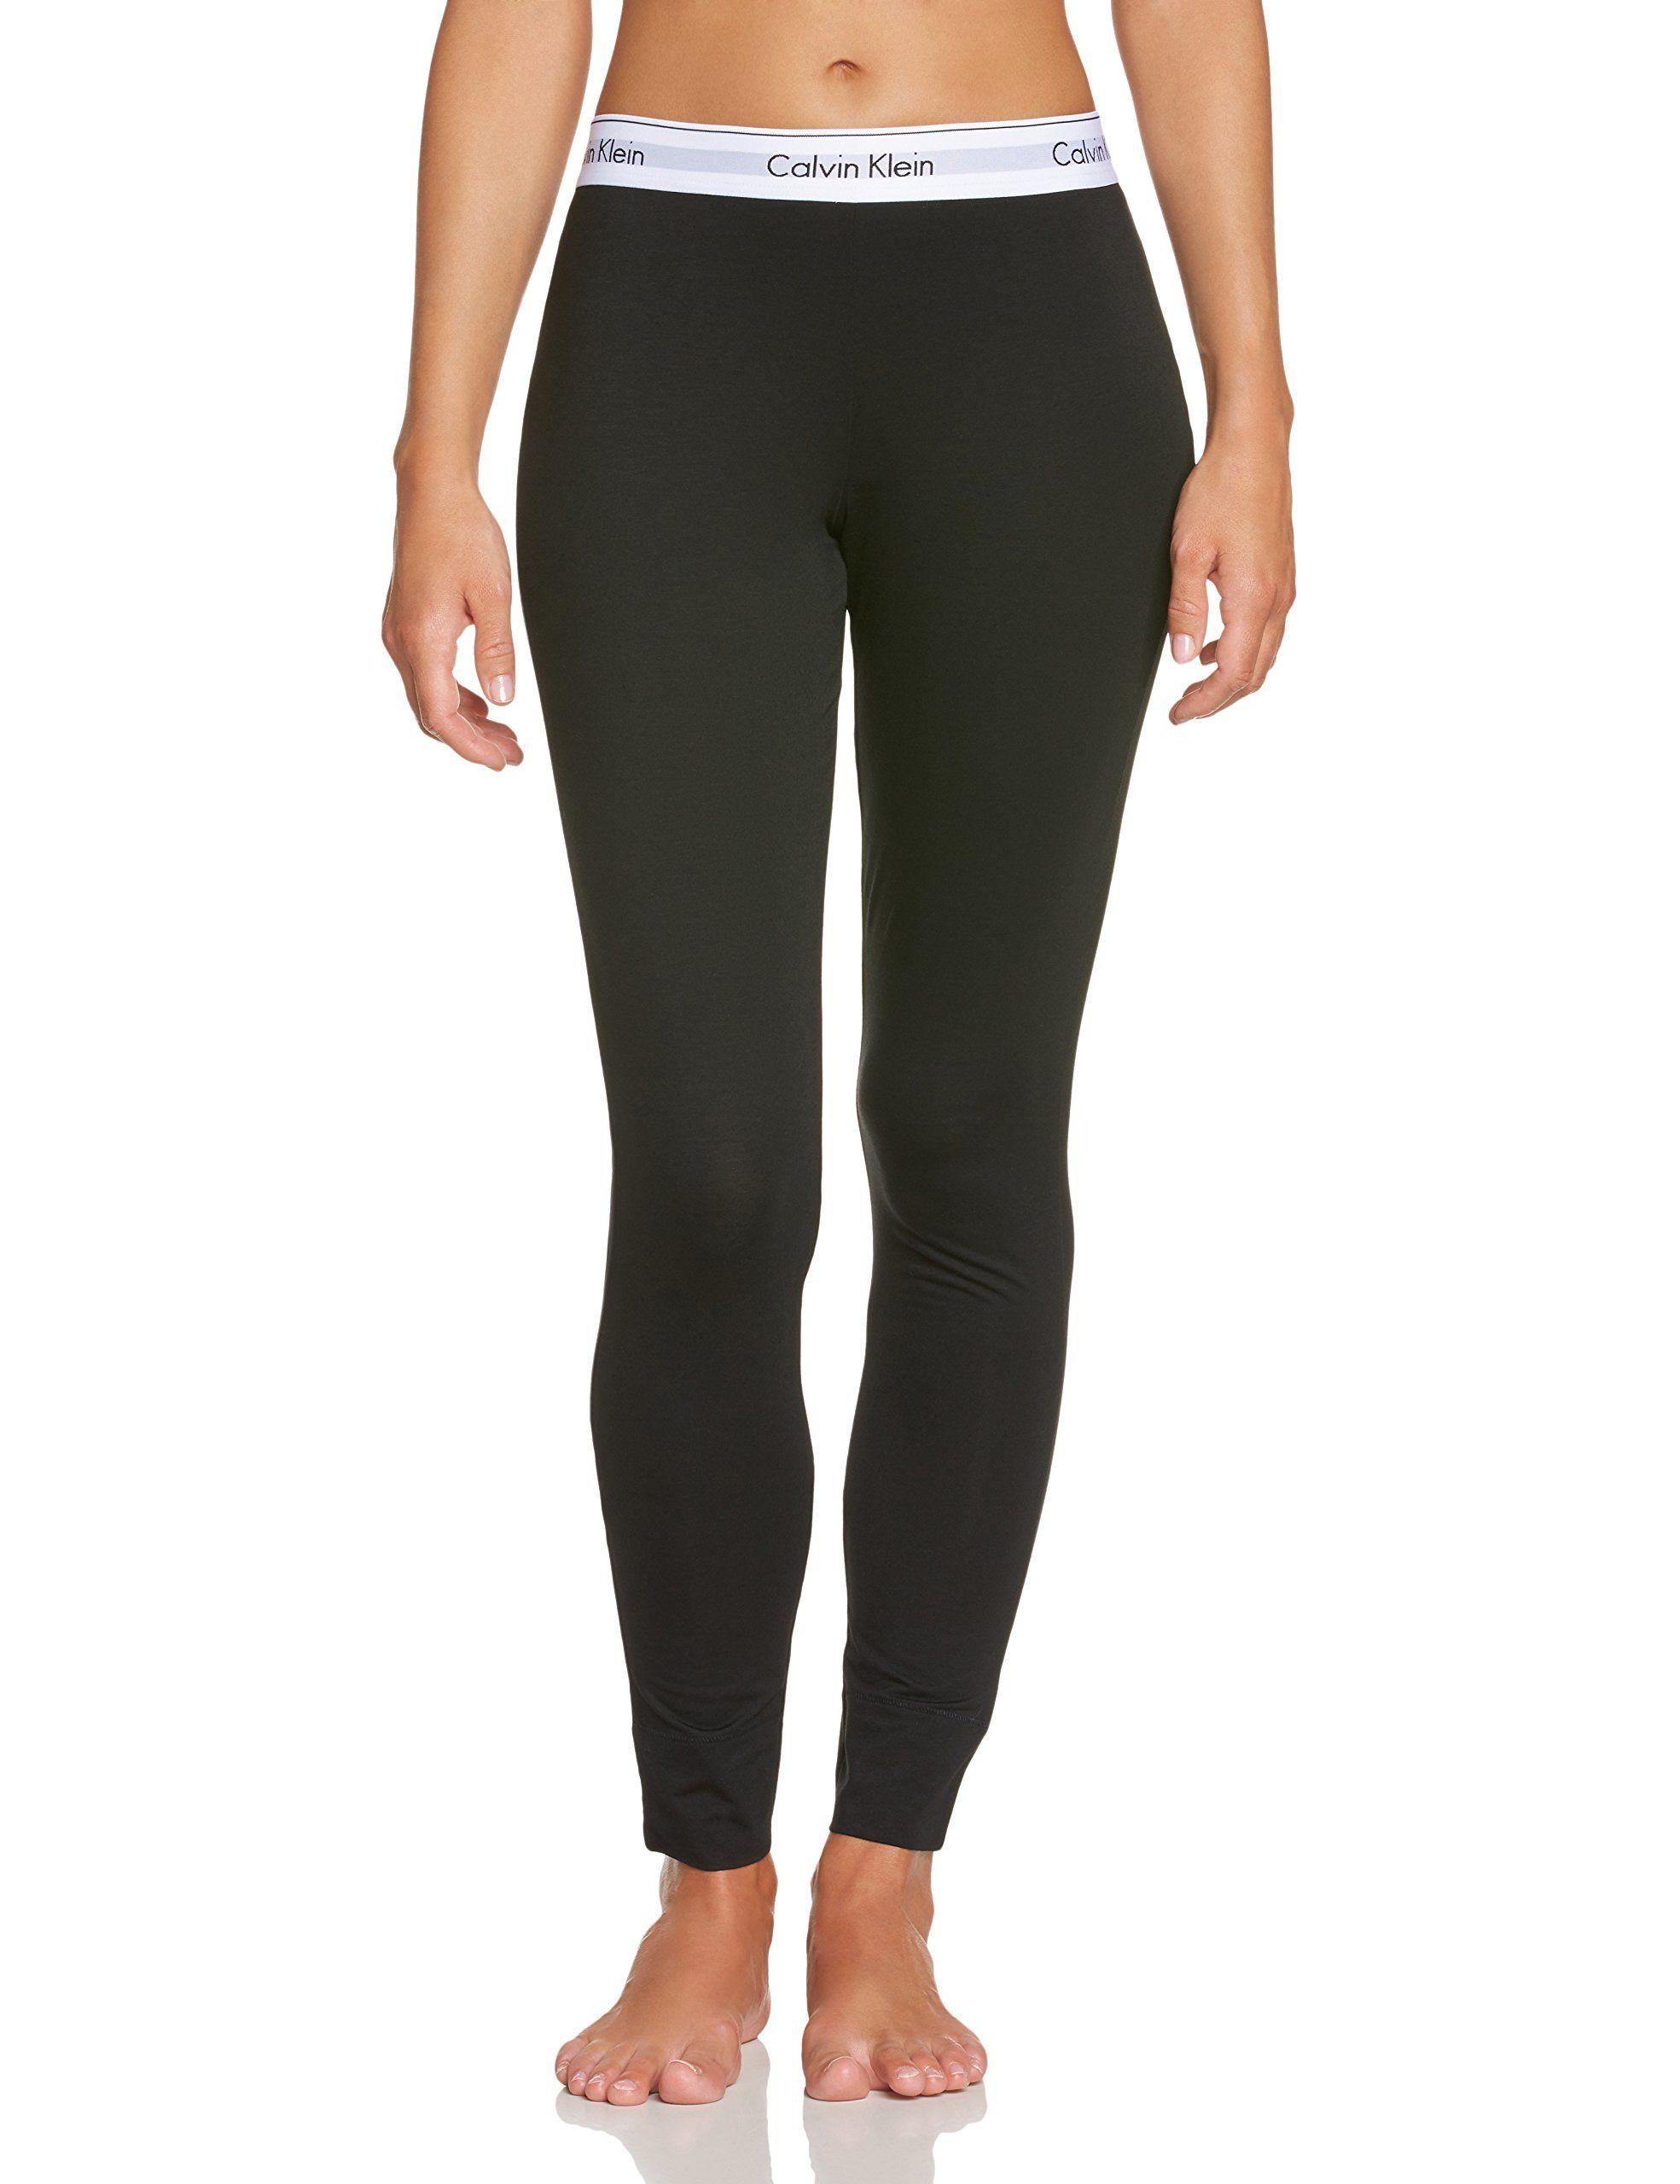 Calvin Klein Underwear Modern - Bas de pyjama - Uni - Femme, Noir (Black  001), 44 901a6567f963